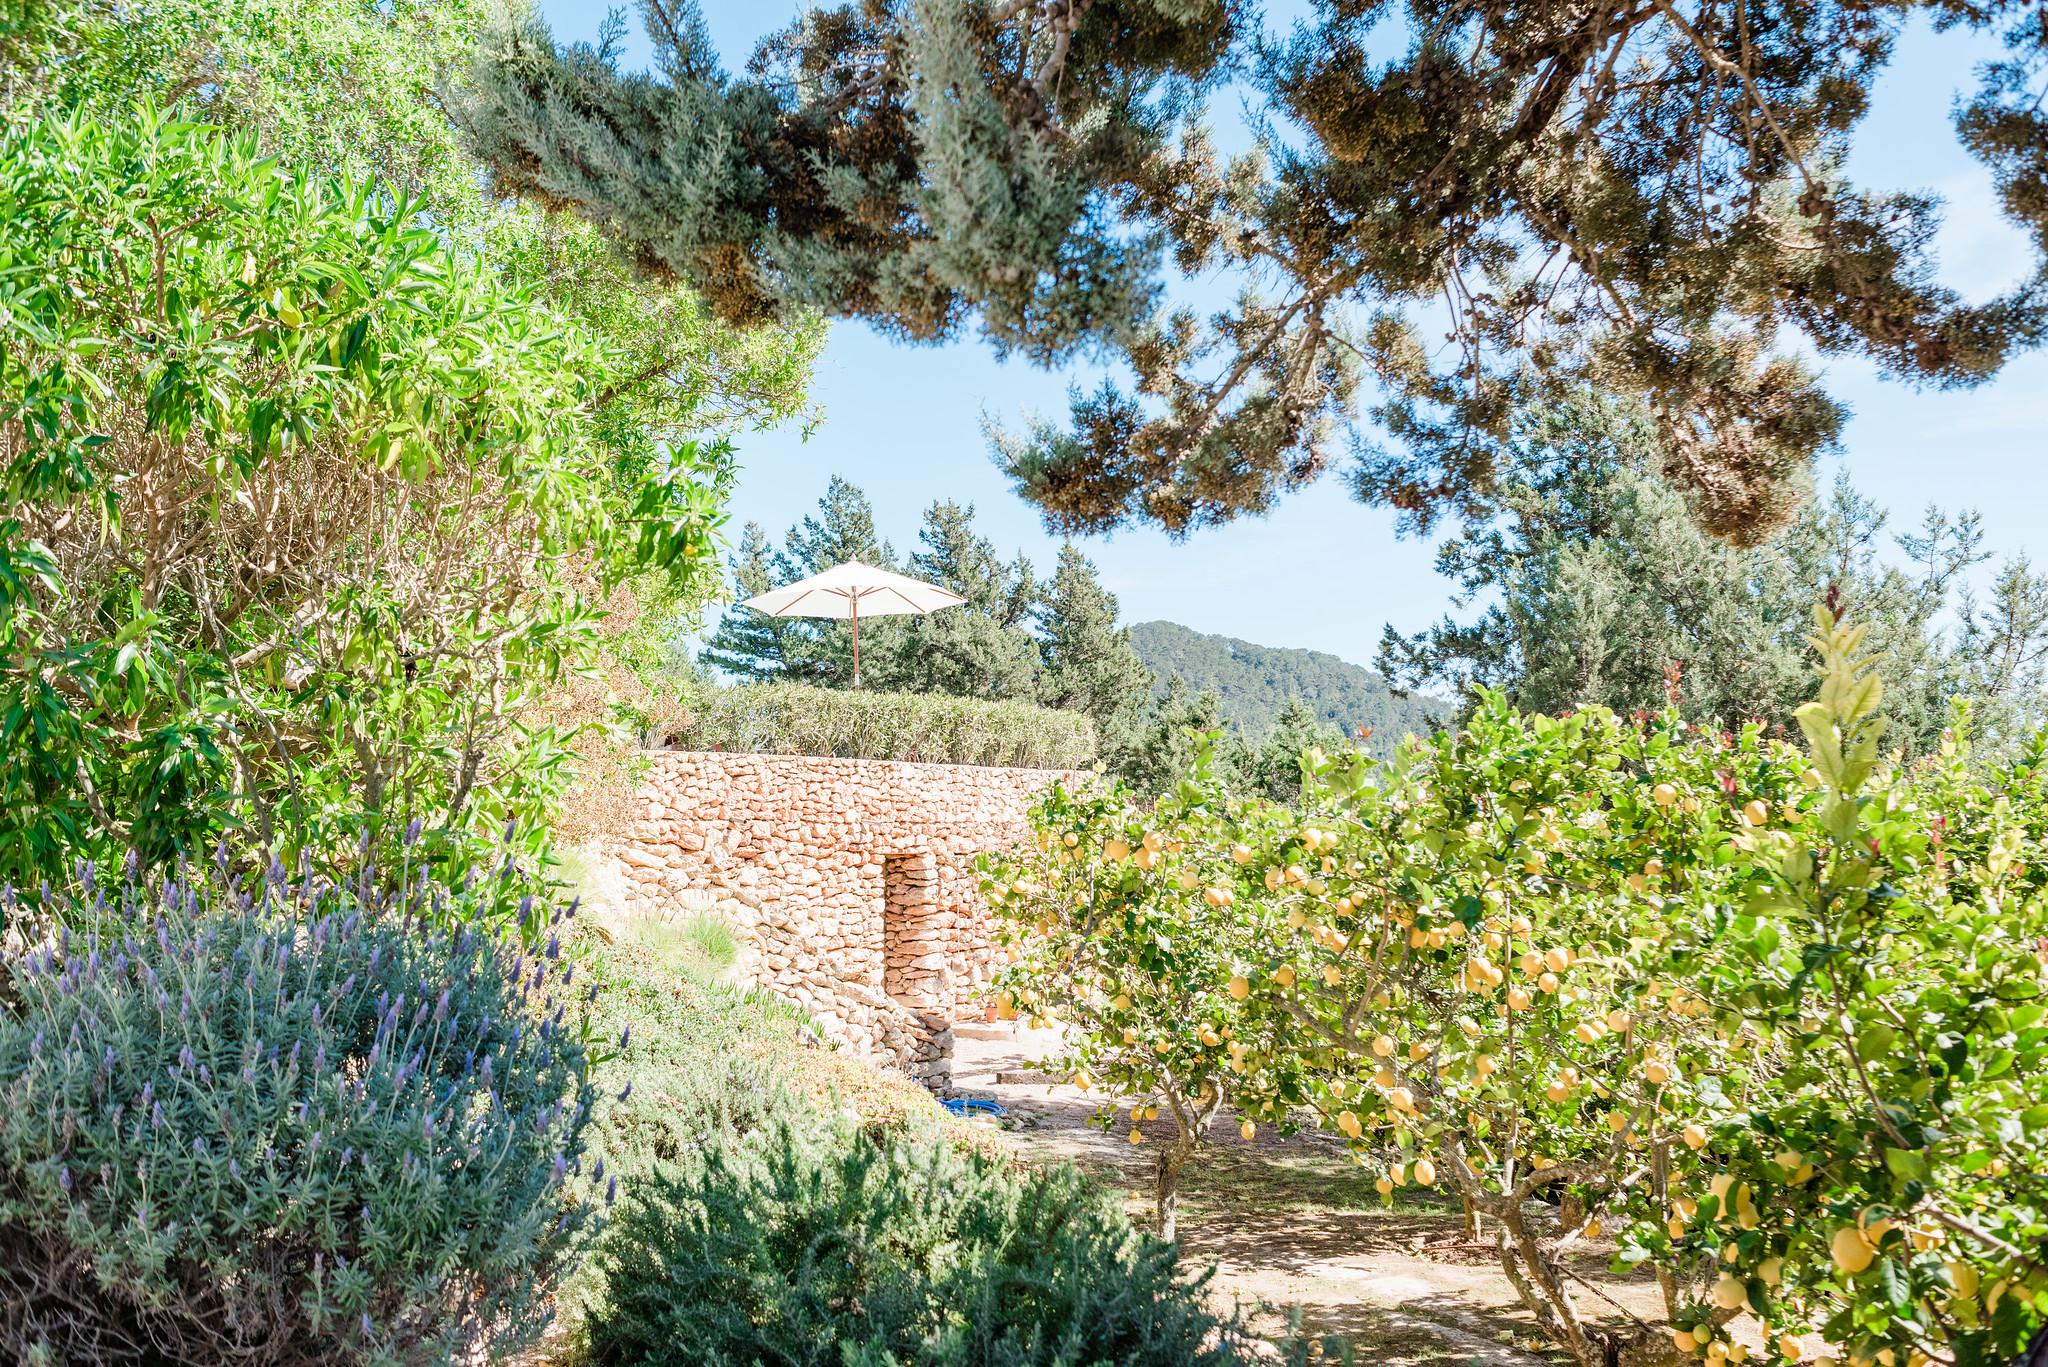 https://www.white-ibiza.com/wp-content/uploads/2020/06/white-ibiza-villas-villa-andrea-exterior-citrus-groves.jpg